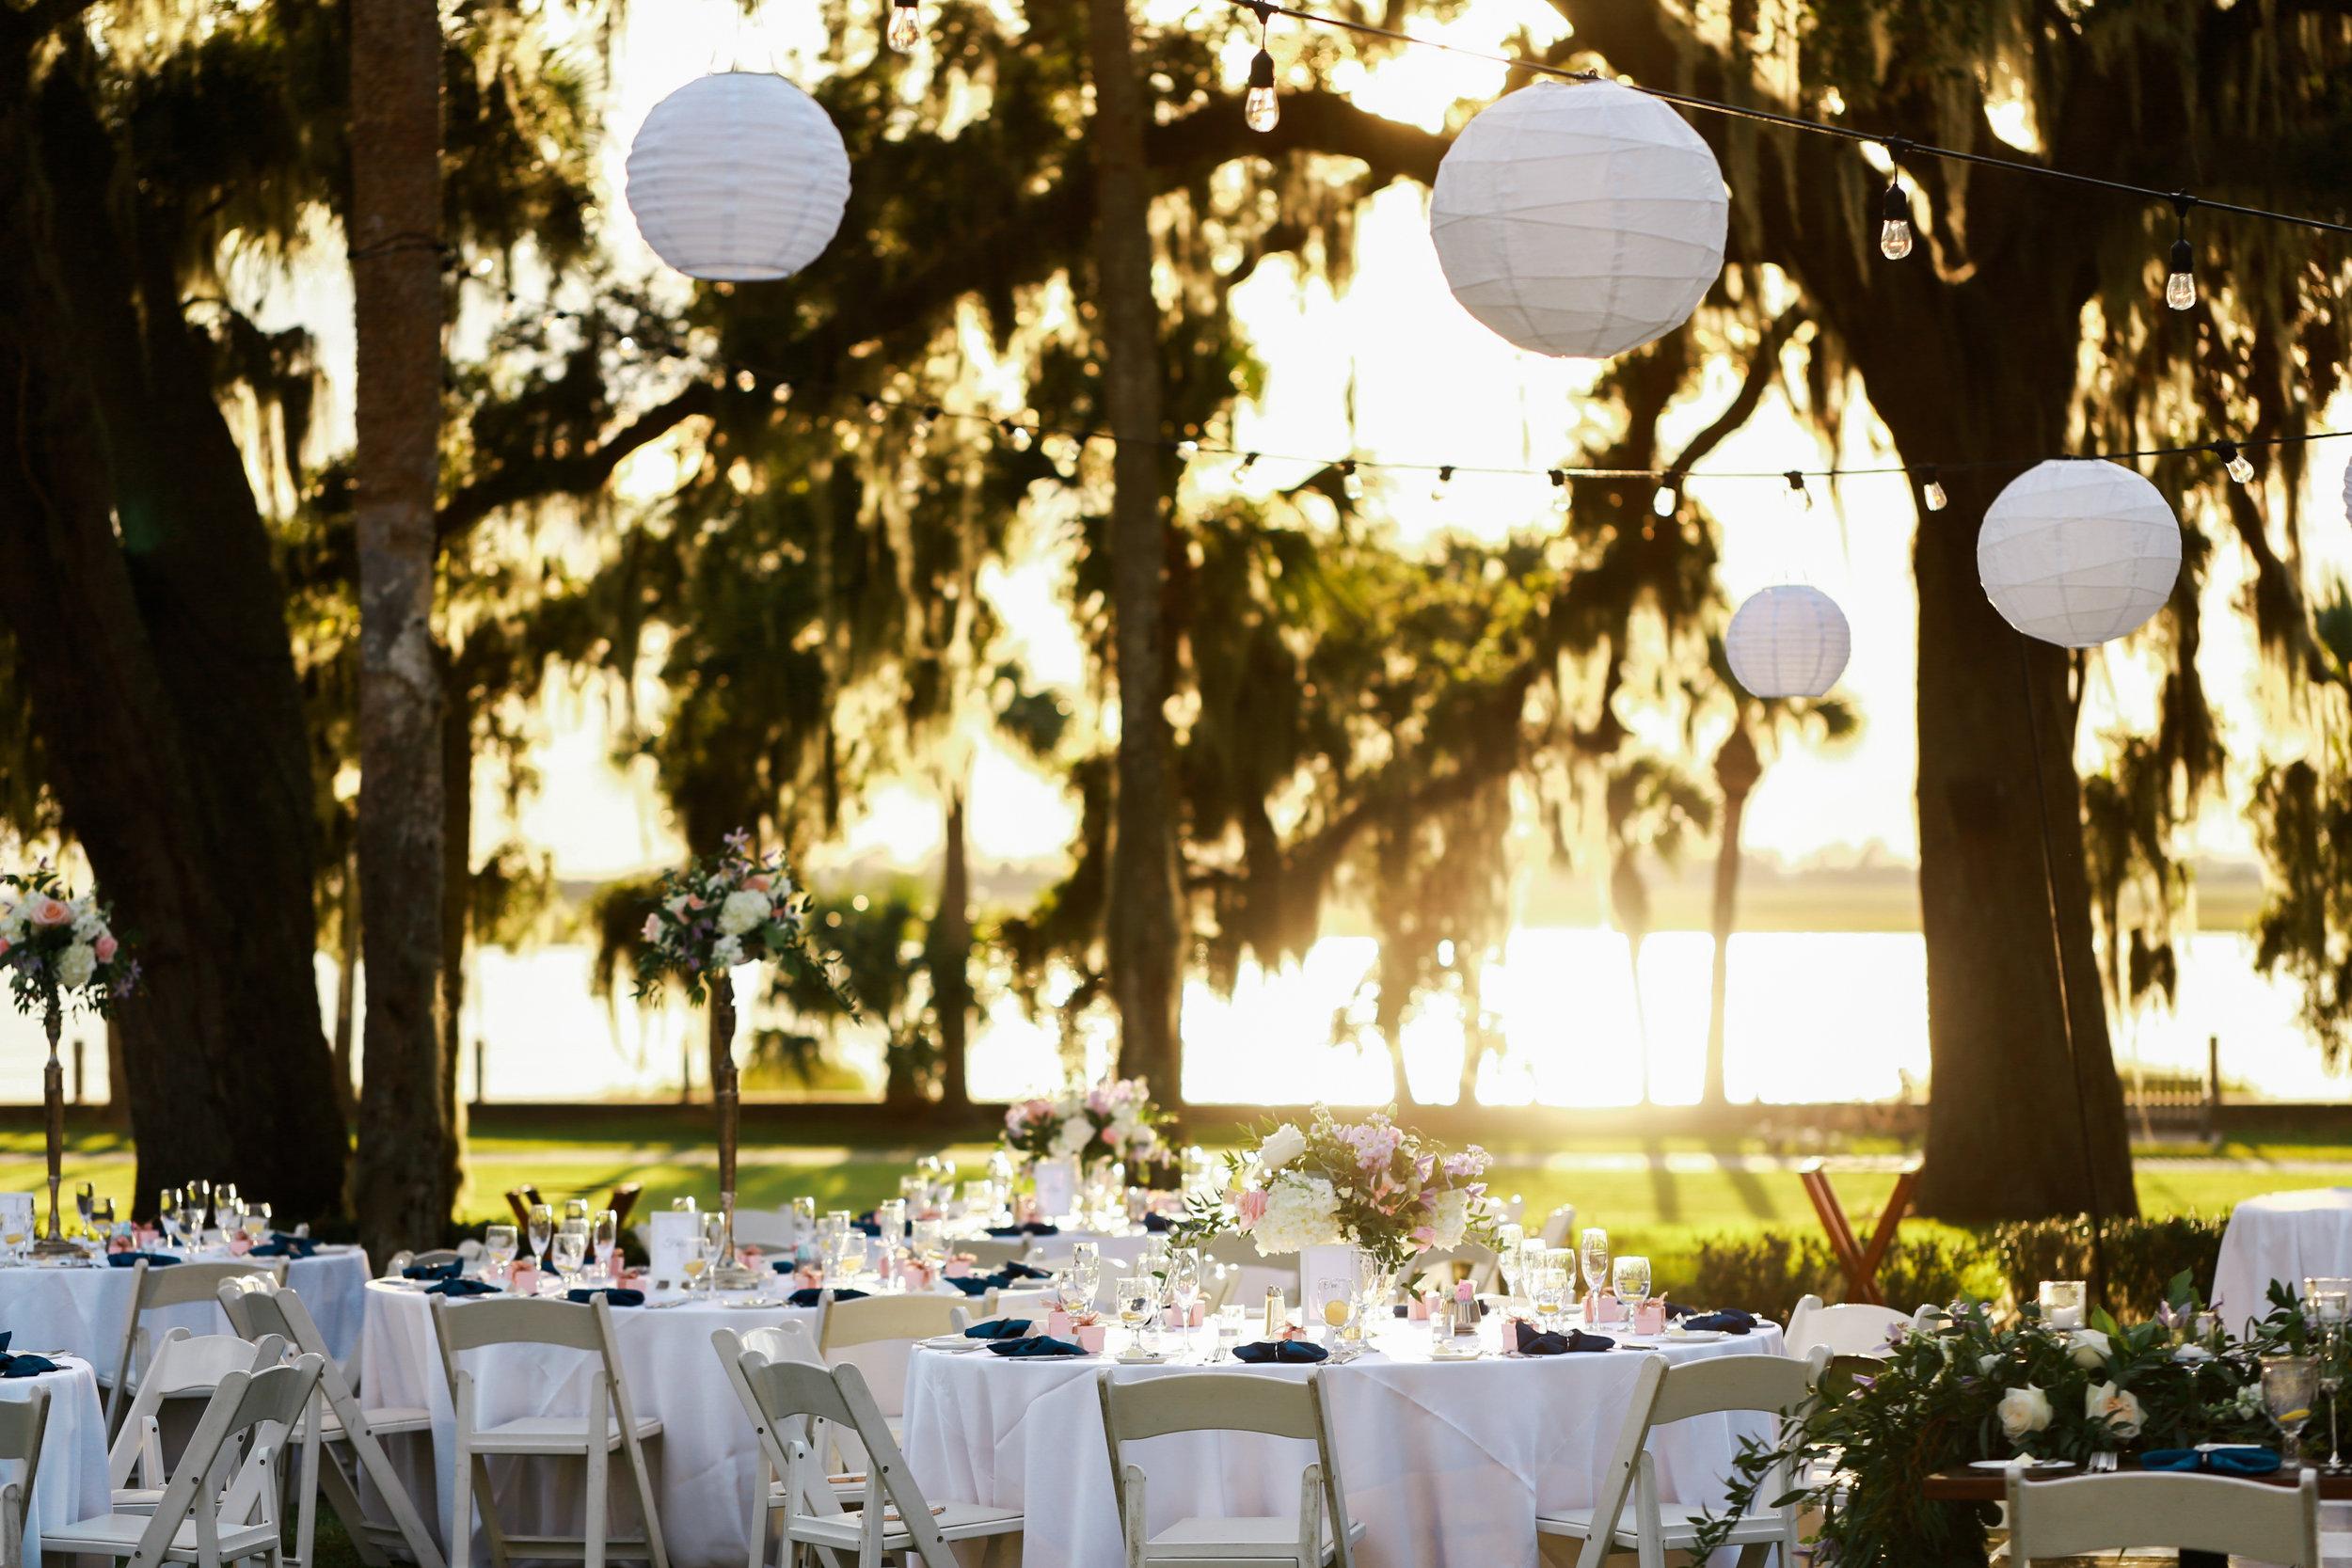 jekyll-island-resort-wedding-14.jpg